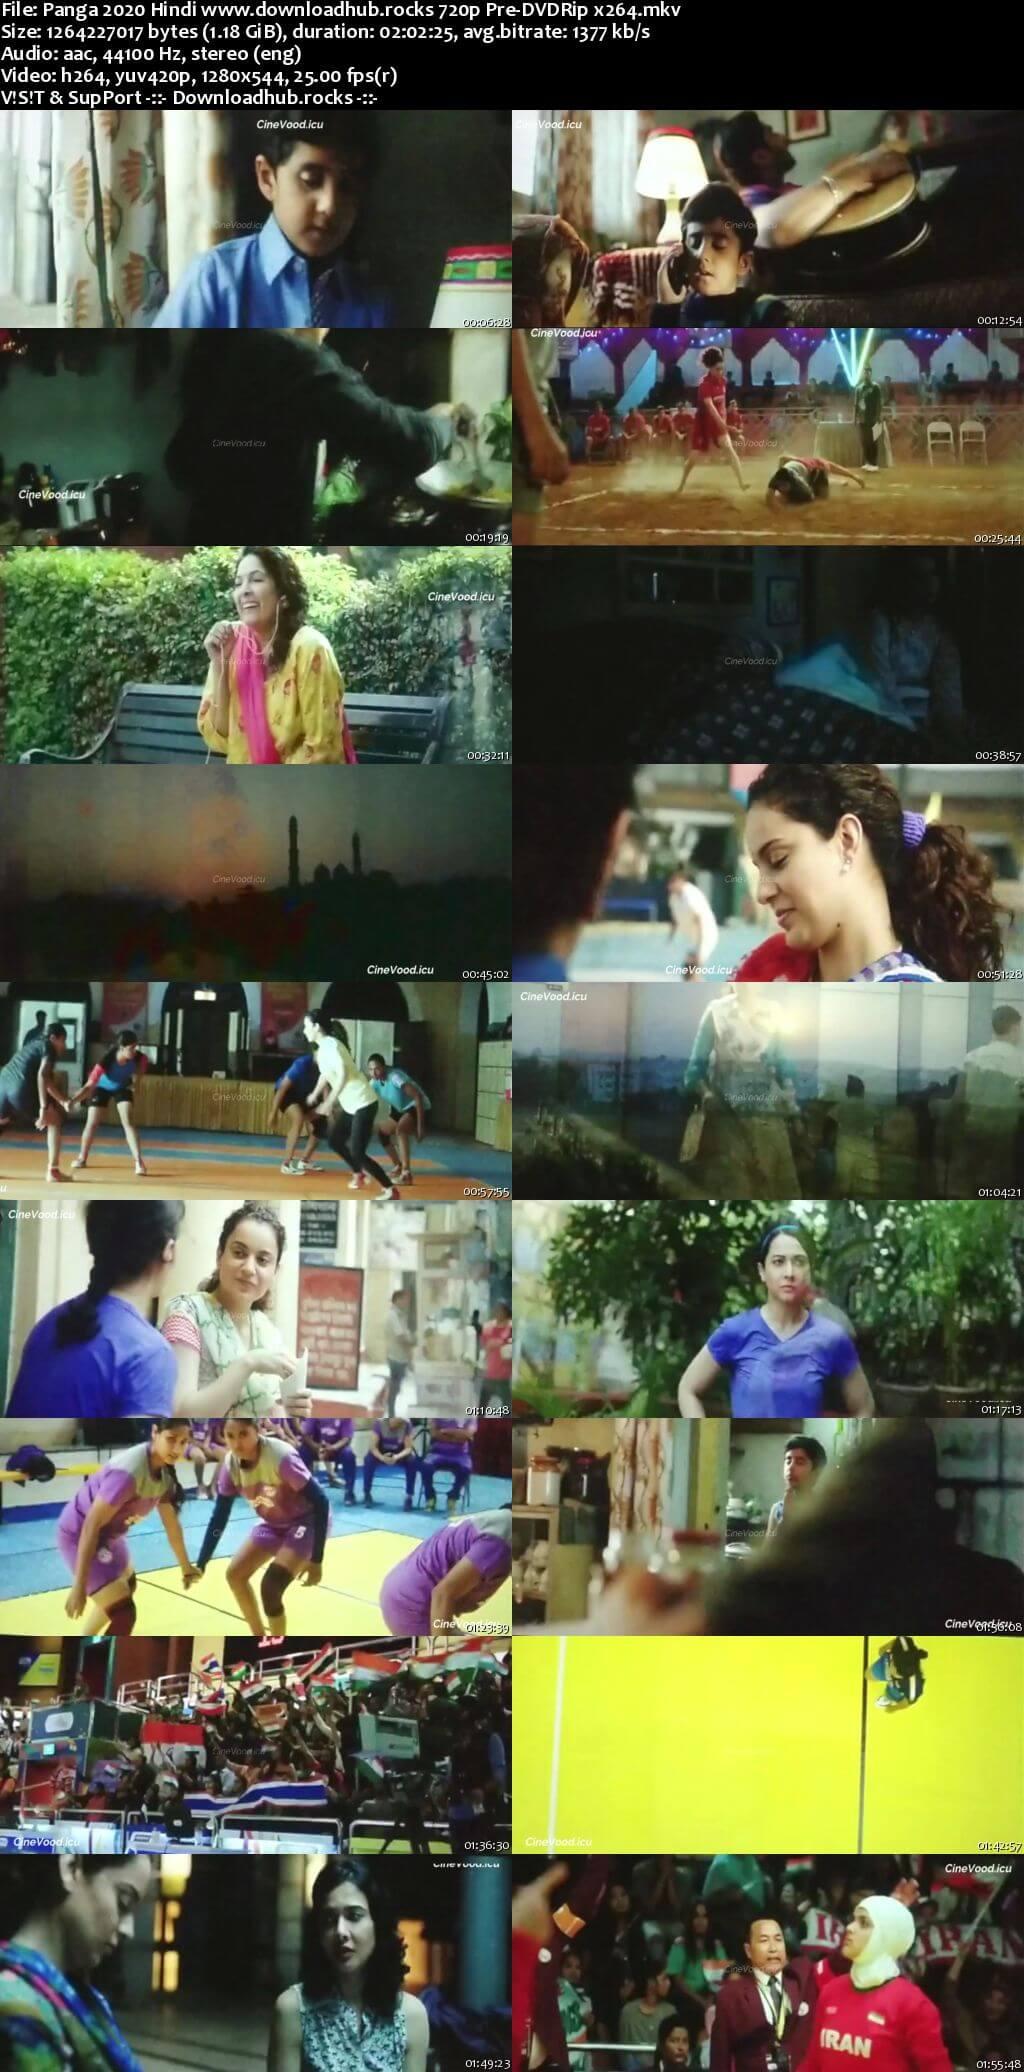 Panga 2020 Hindi 720p 480p Pre-DVDRip x264